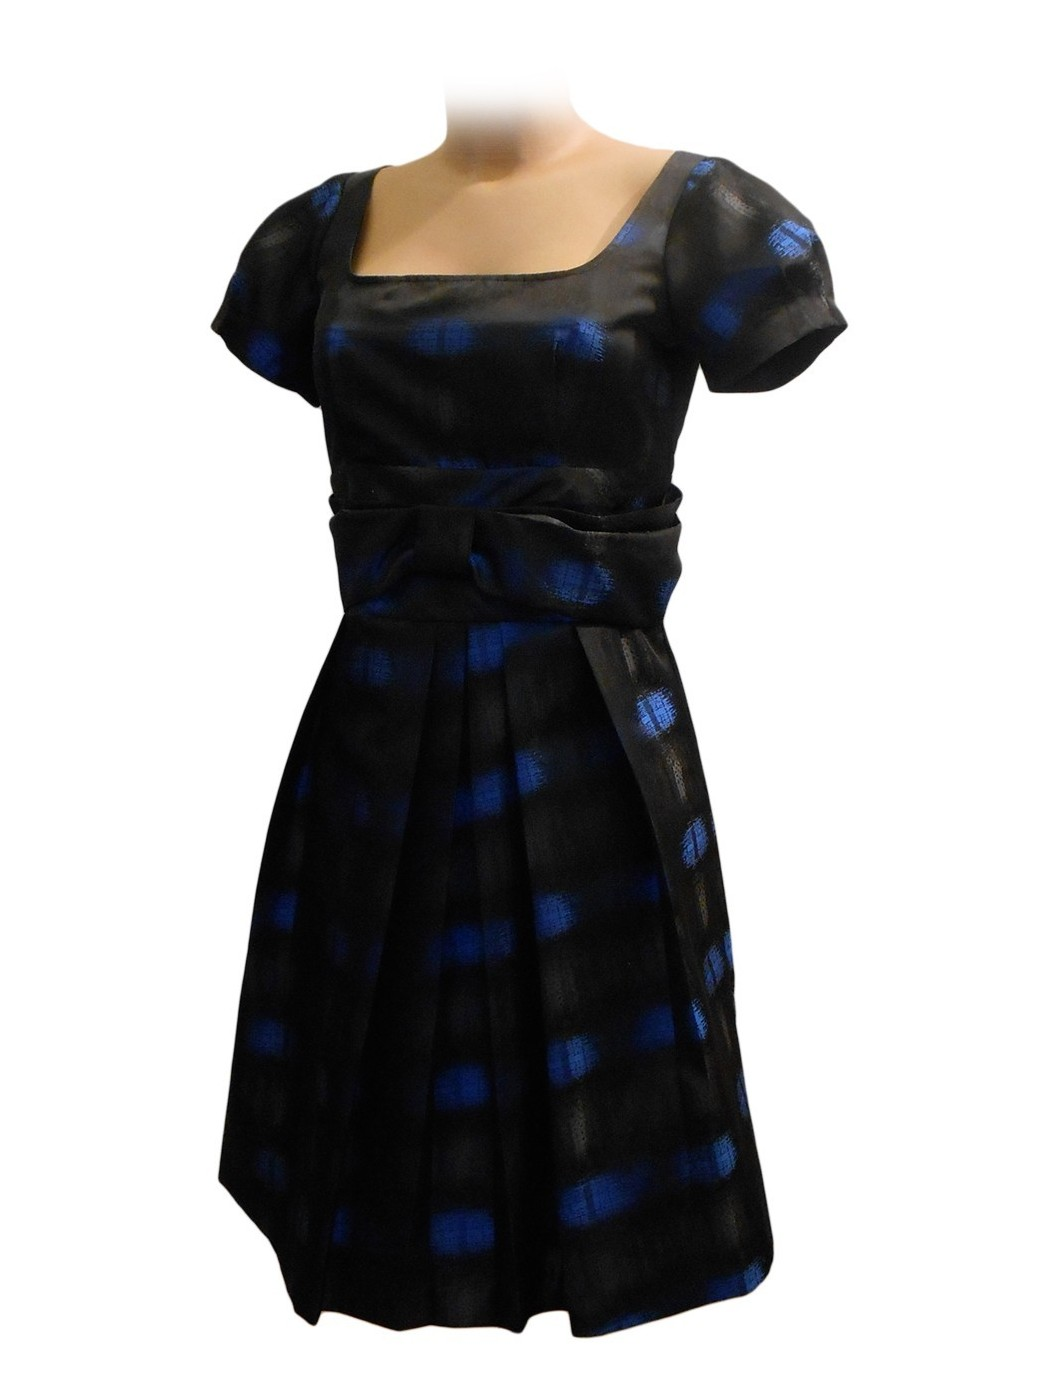 Эдди B жакет и платье.